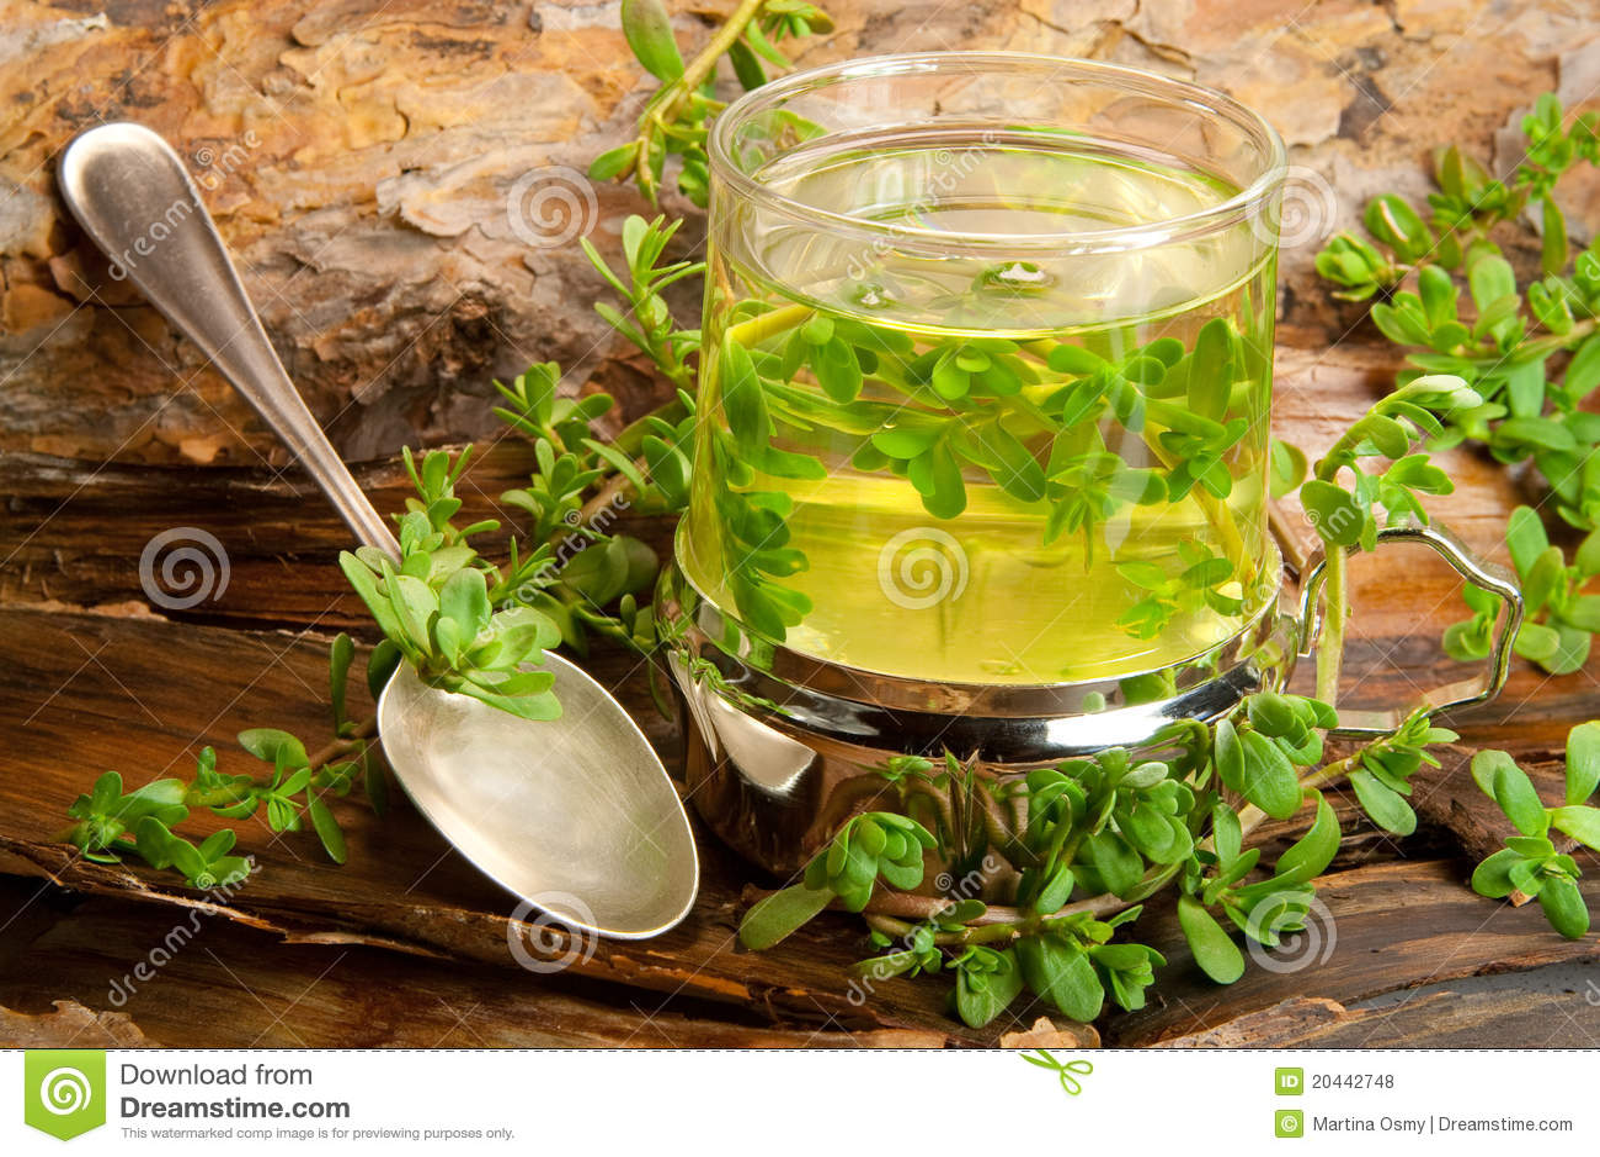 Health Benefits of Pennywort or Gotu Kola  CalorieBee